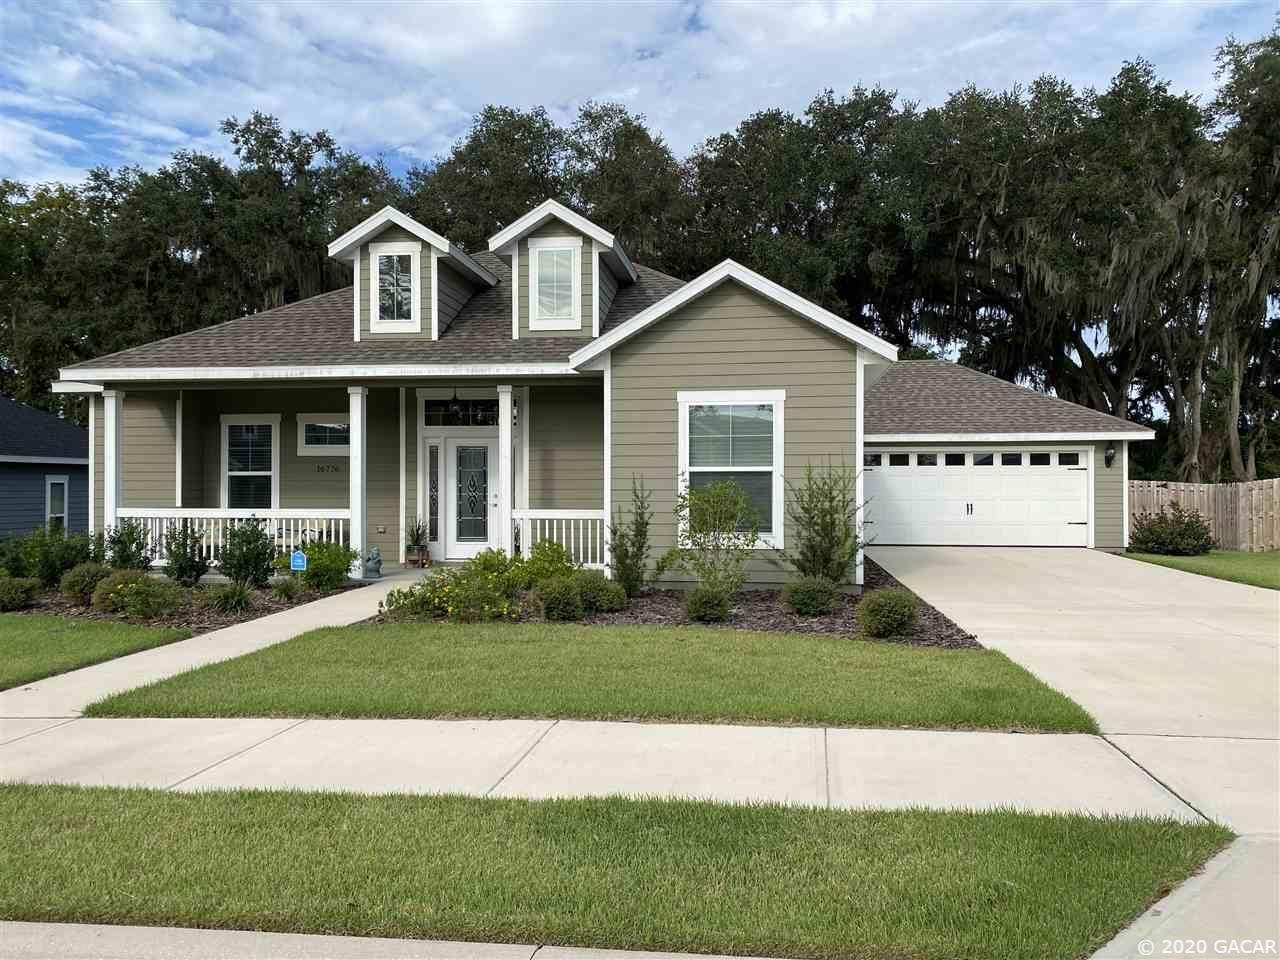 16776 NW 168th Terrace, Alachua, FL 32615 - #: 438220